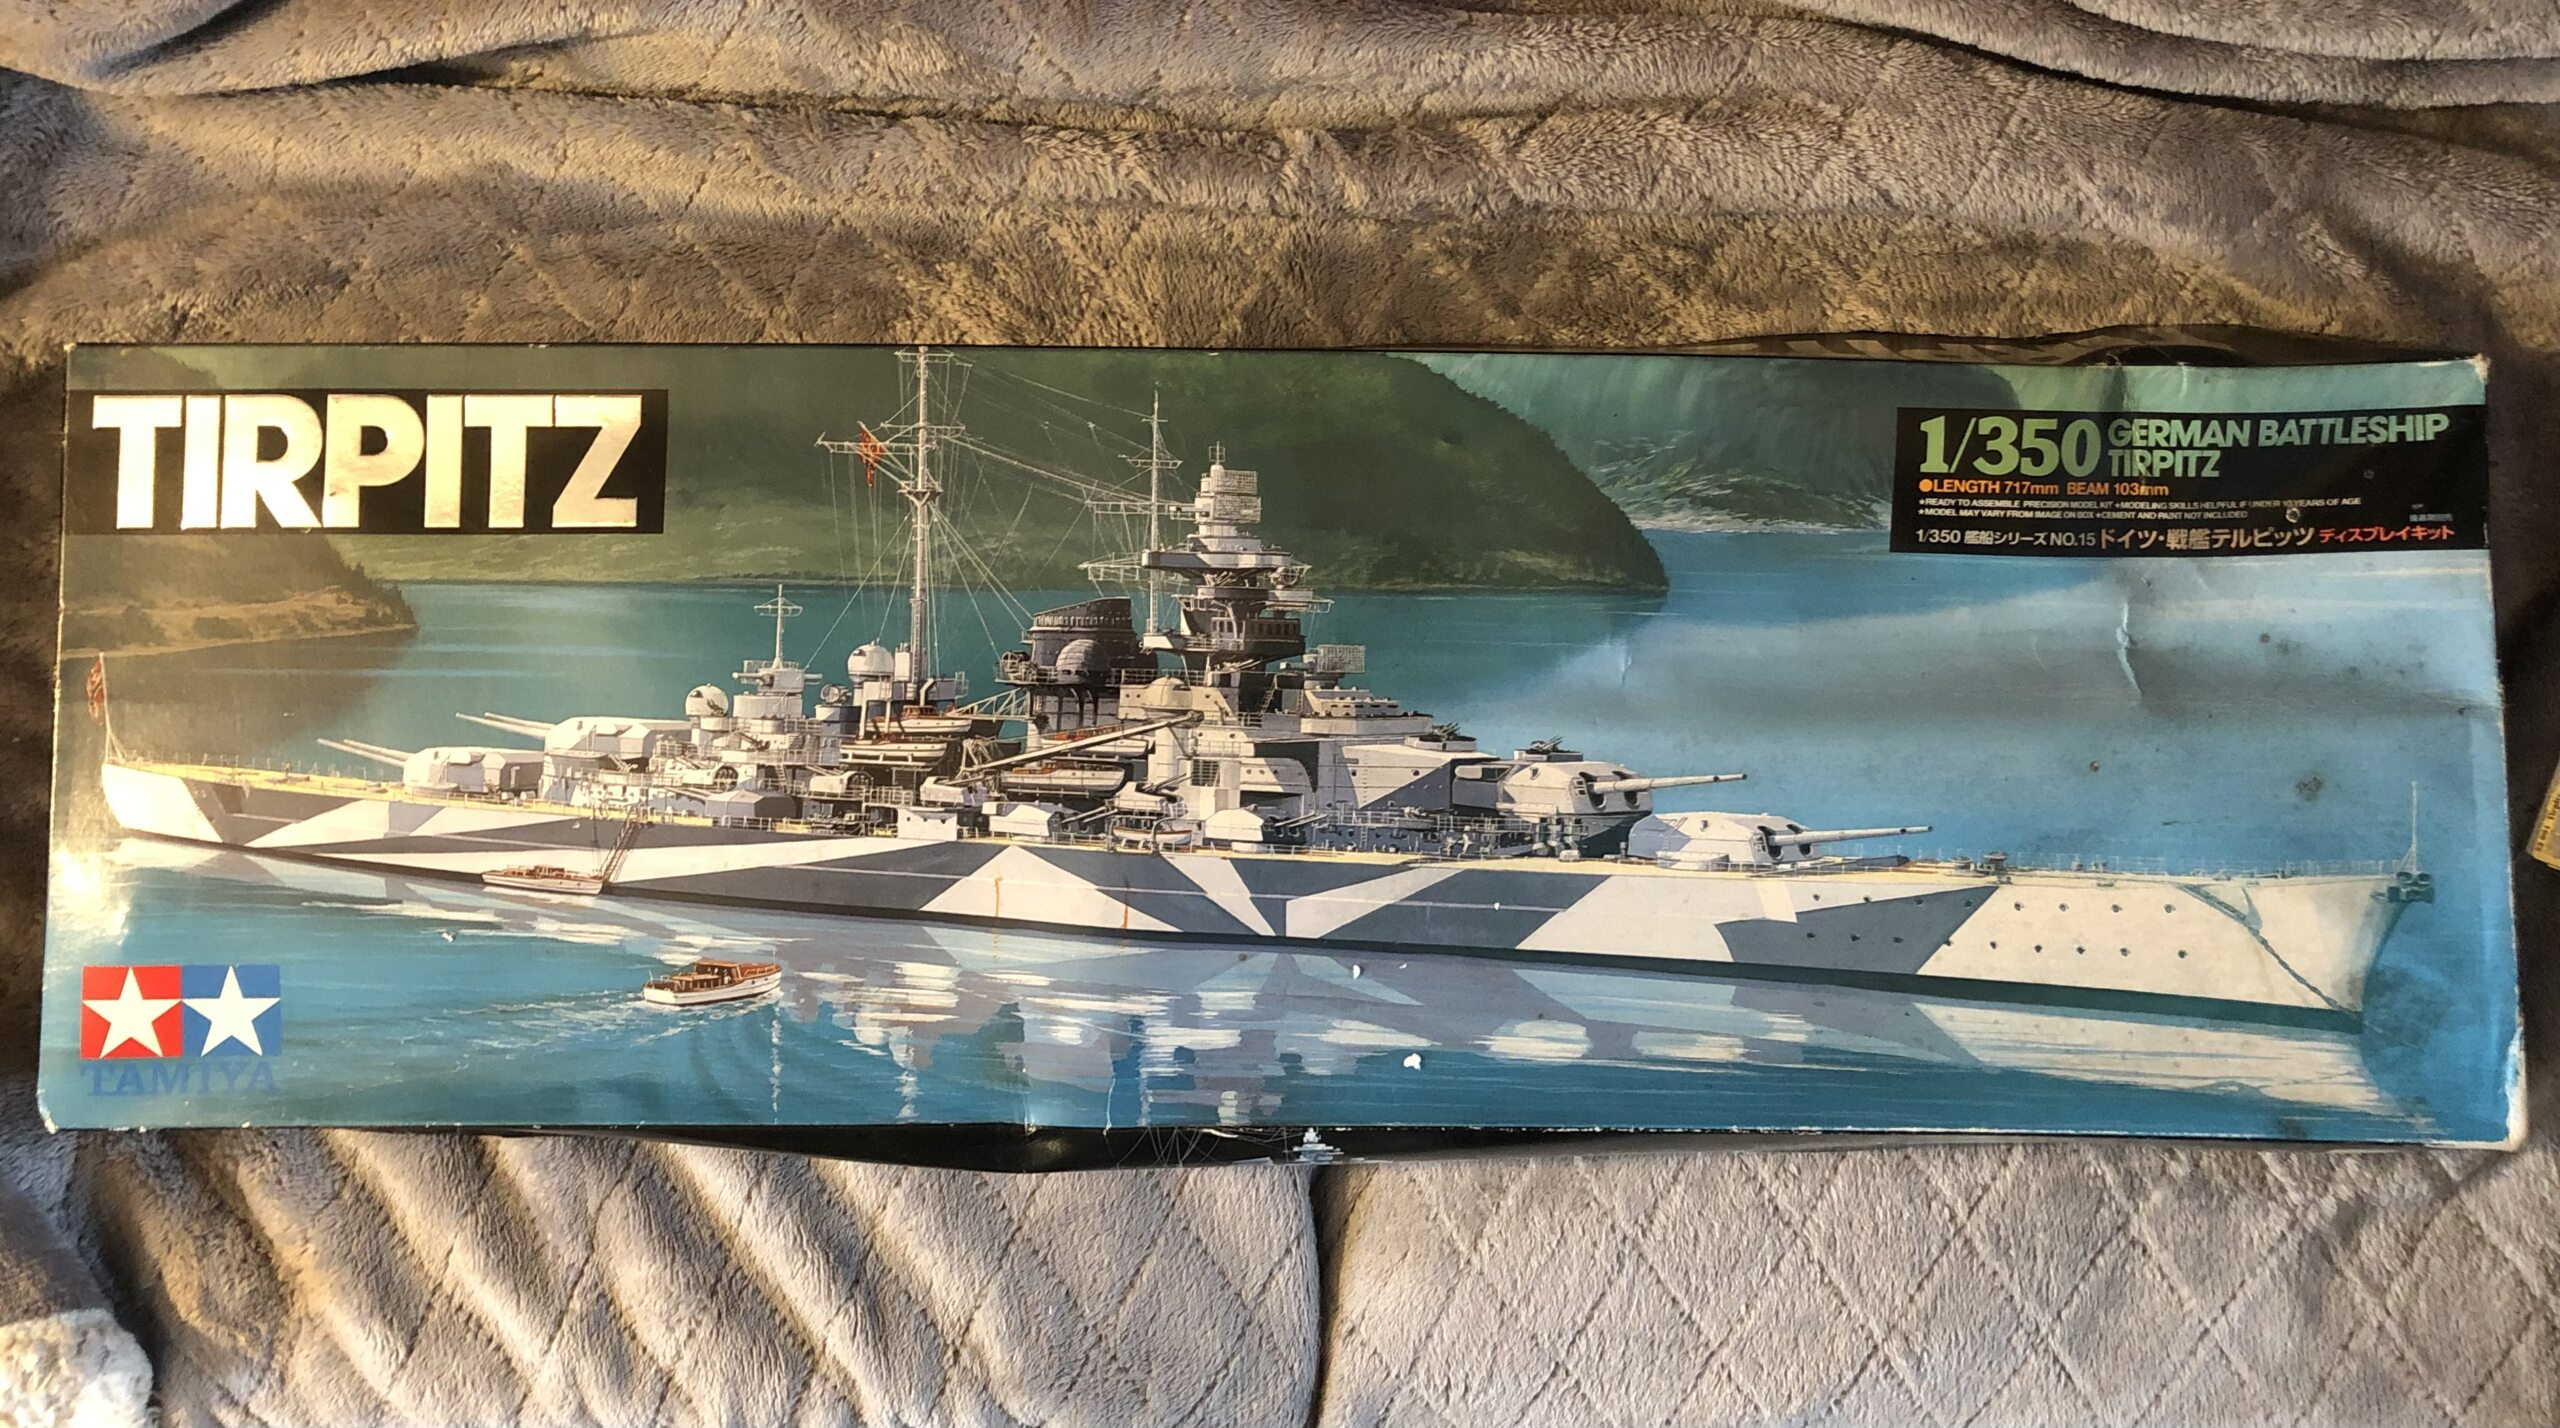 Tirpitz 1/350 Tamiya + eduard - Eric78 09ed7b10